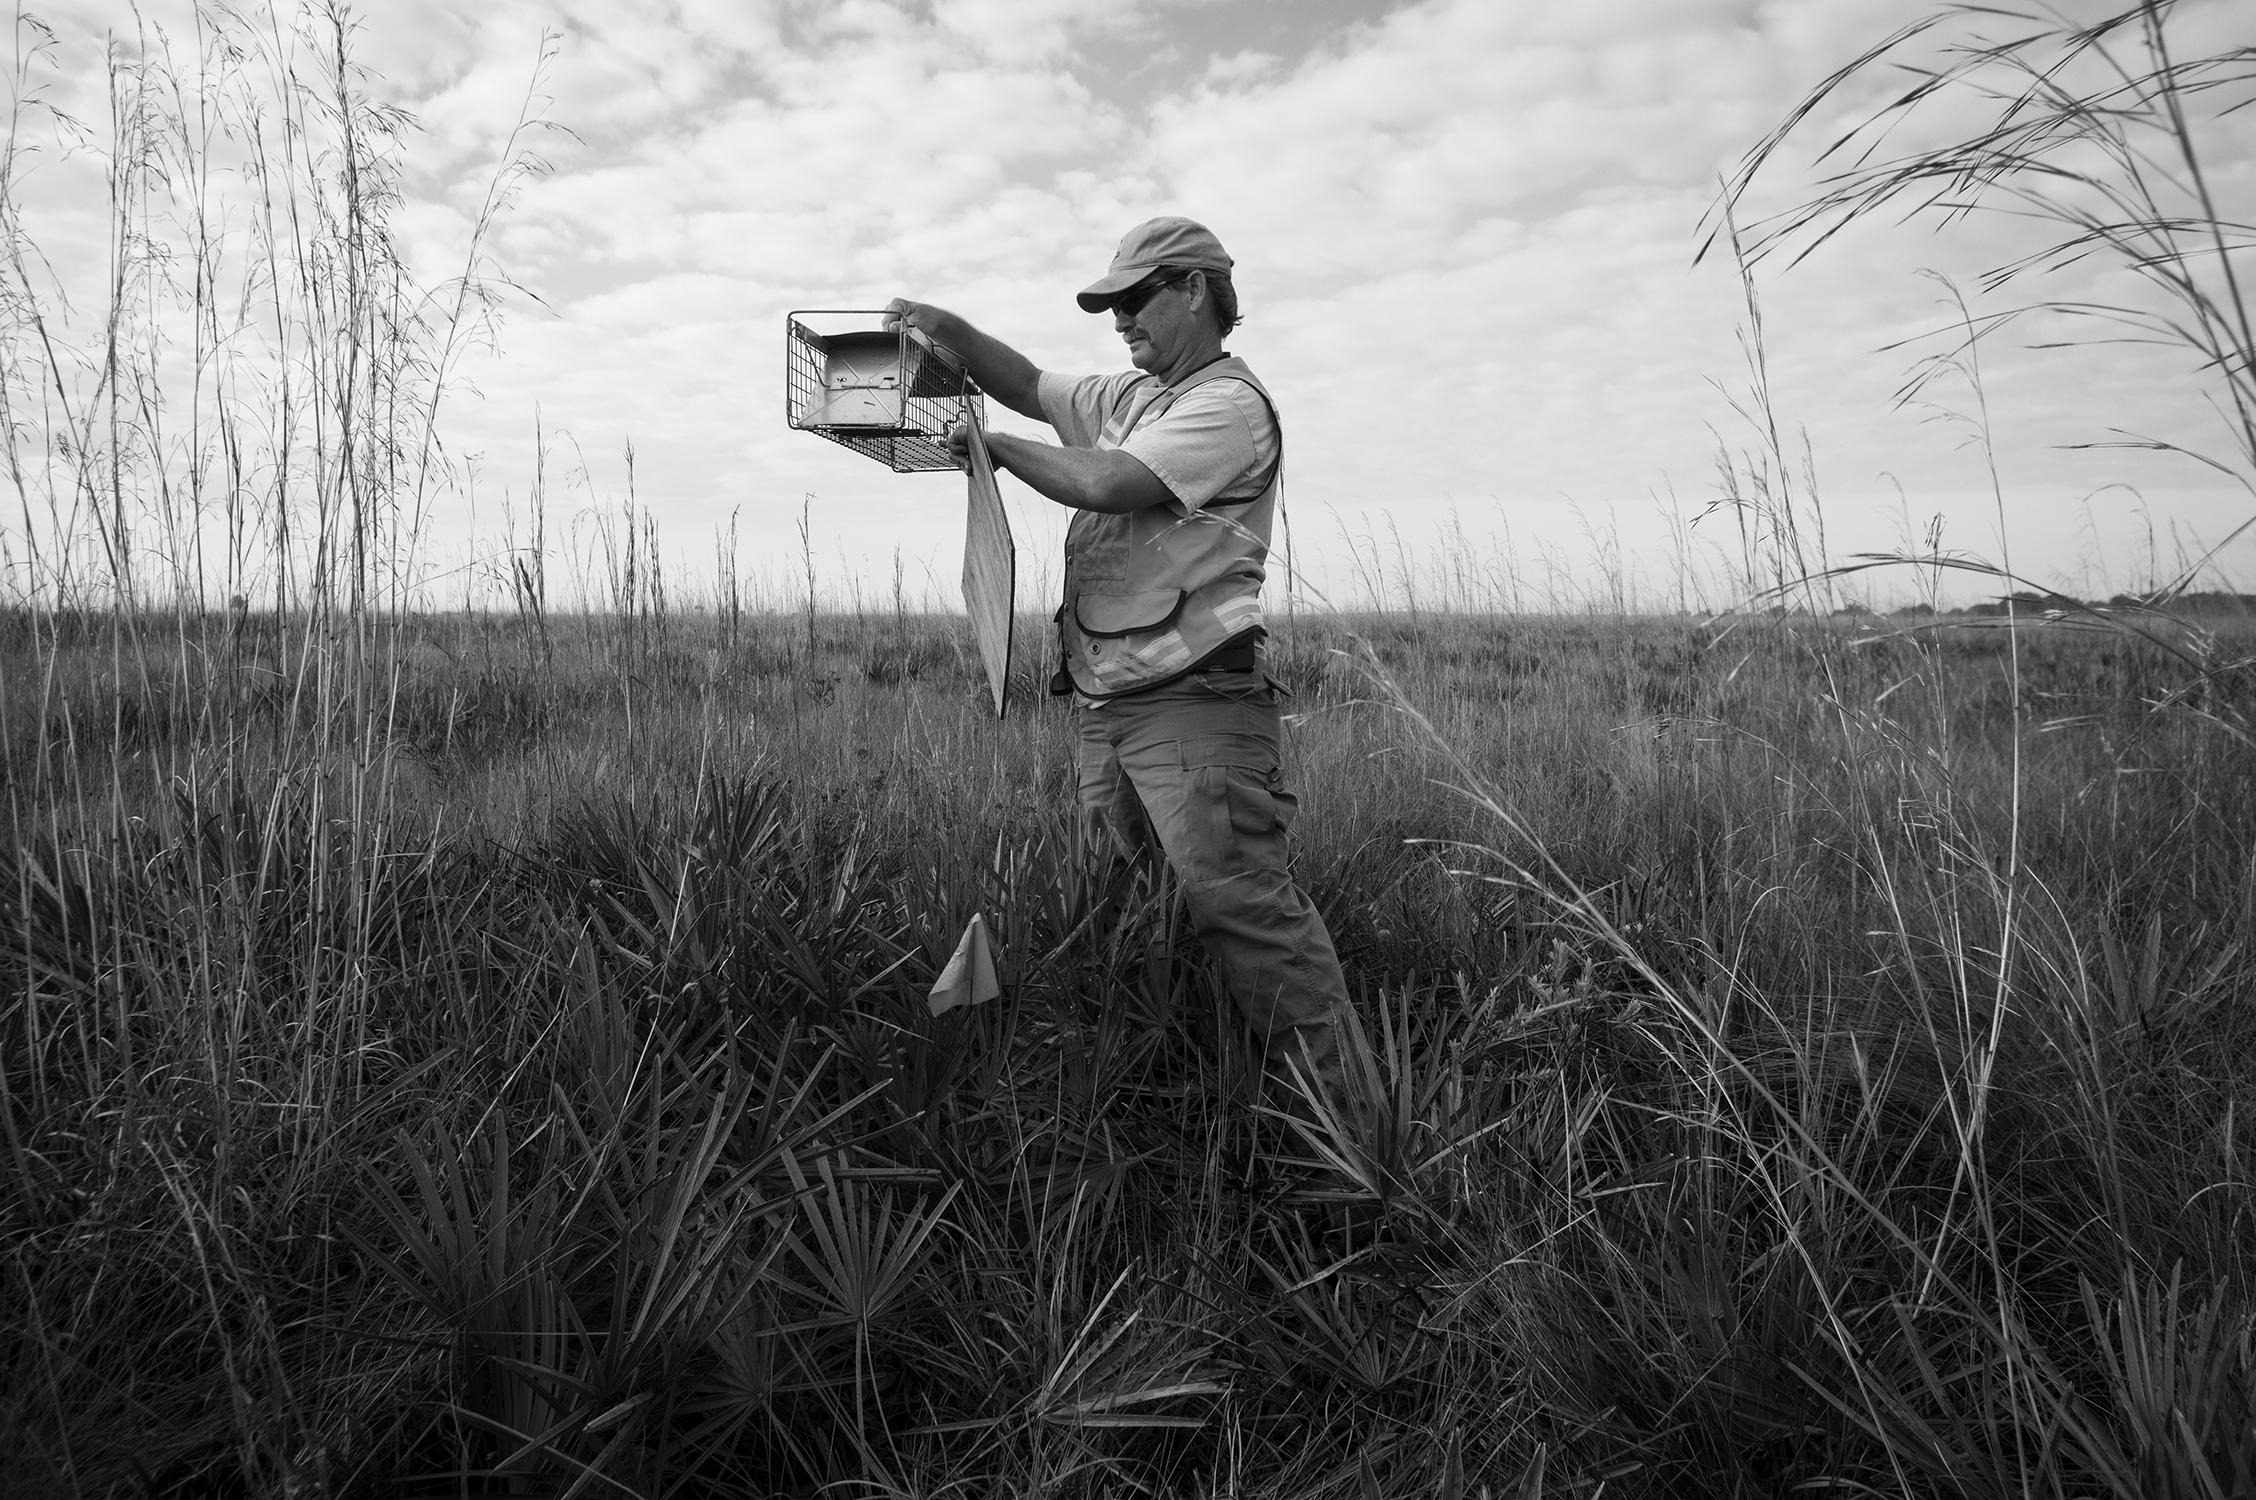 Biologist Steve Glass checks a mammal trap for Spotted Skunks.